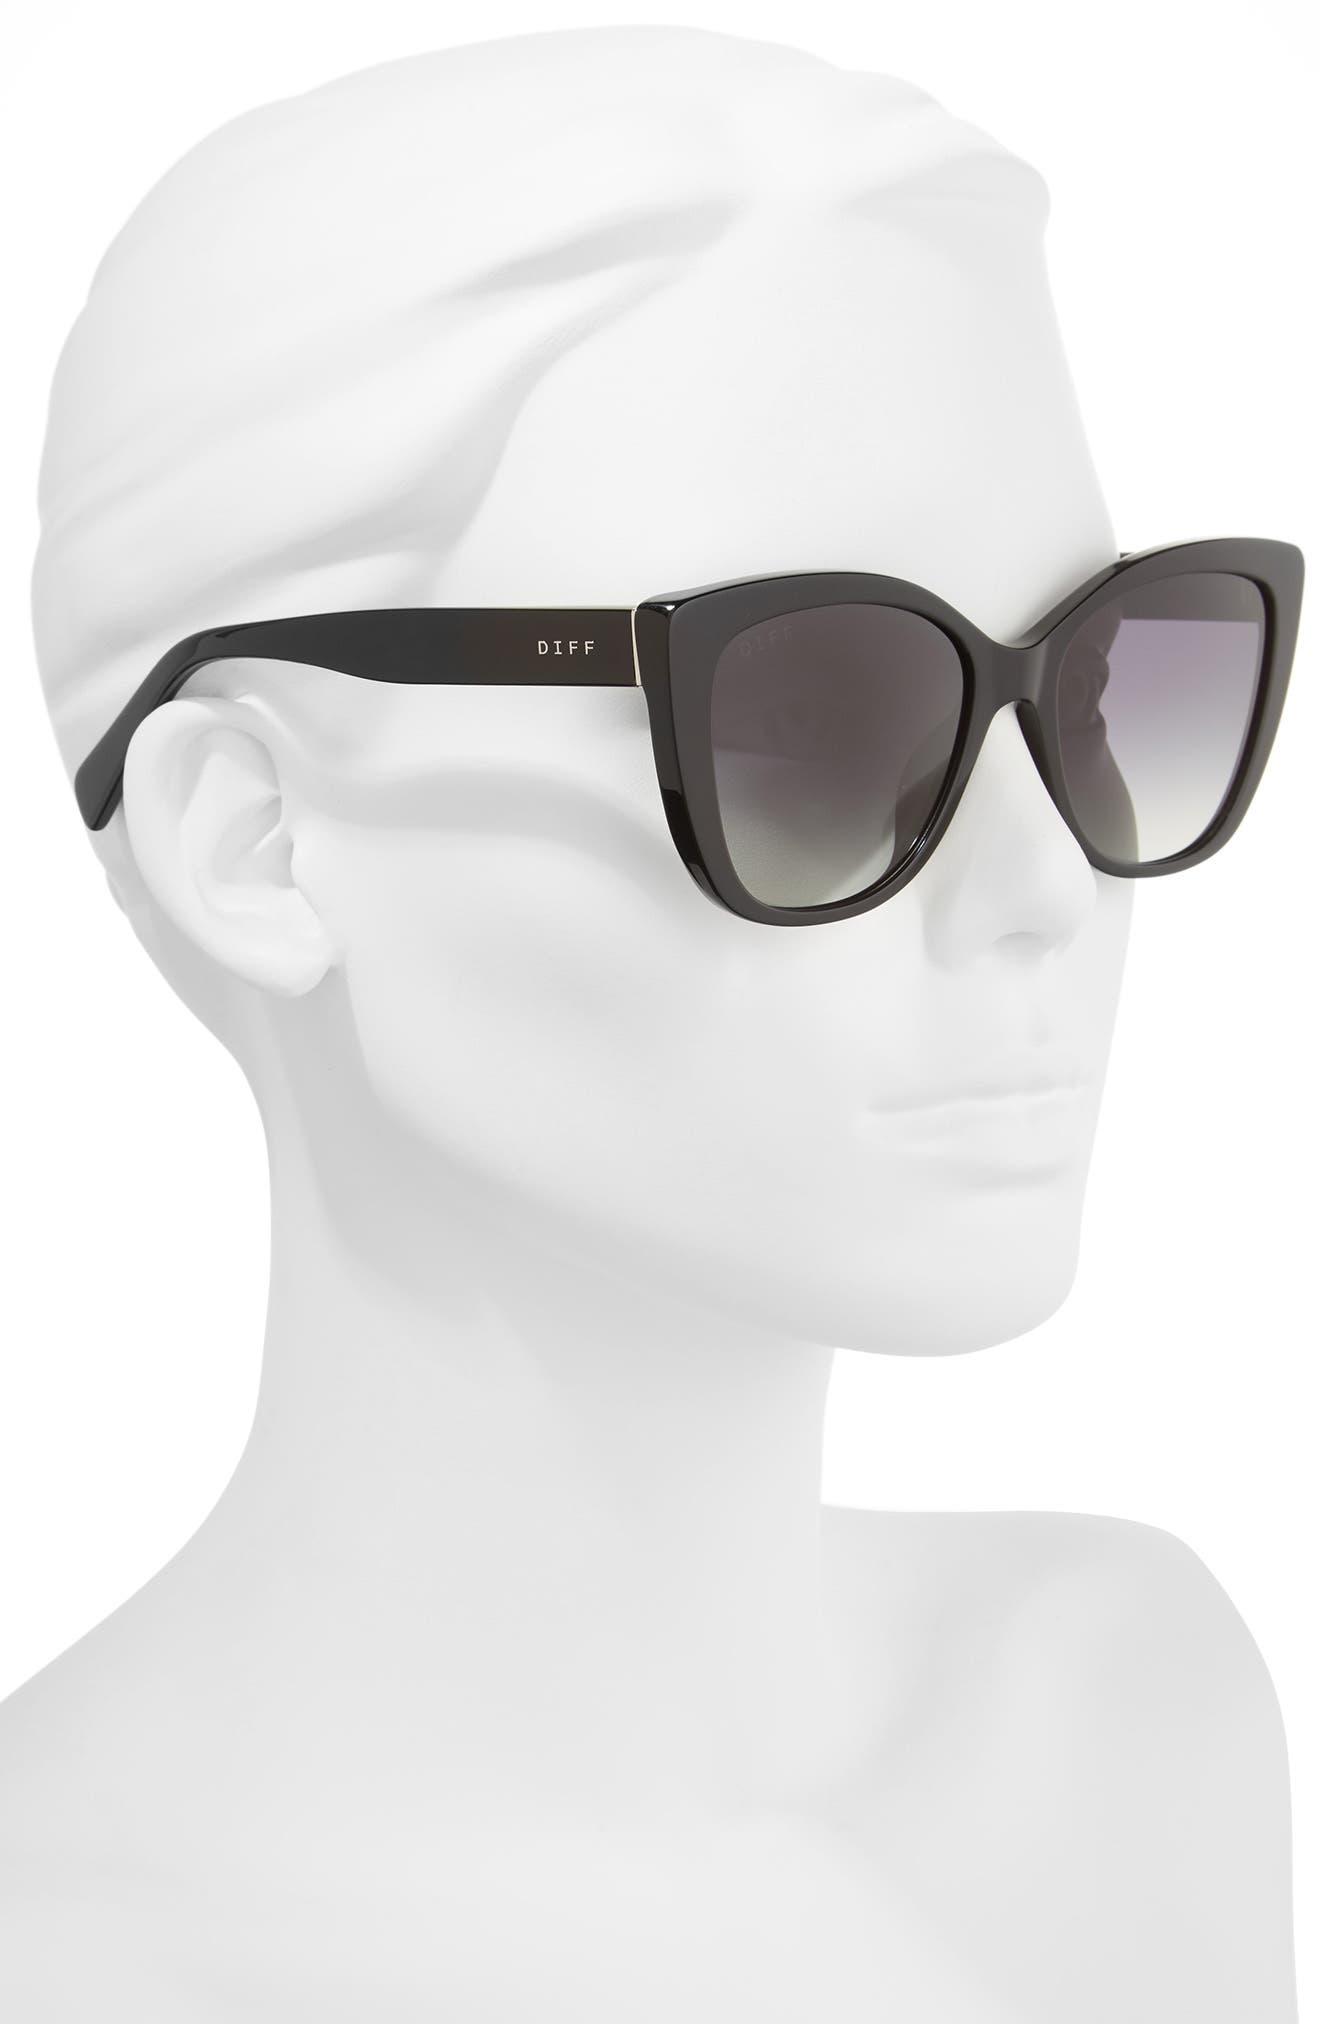 Ruby 54mm Polarized Sunglasses,                             Alternate thumbnail 2, color,                             Black/ Grey